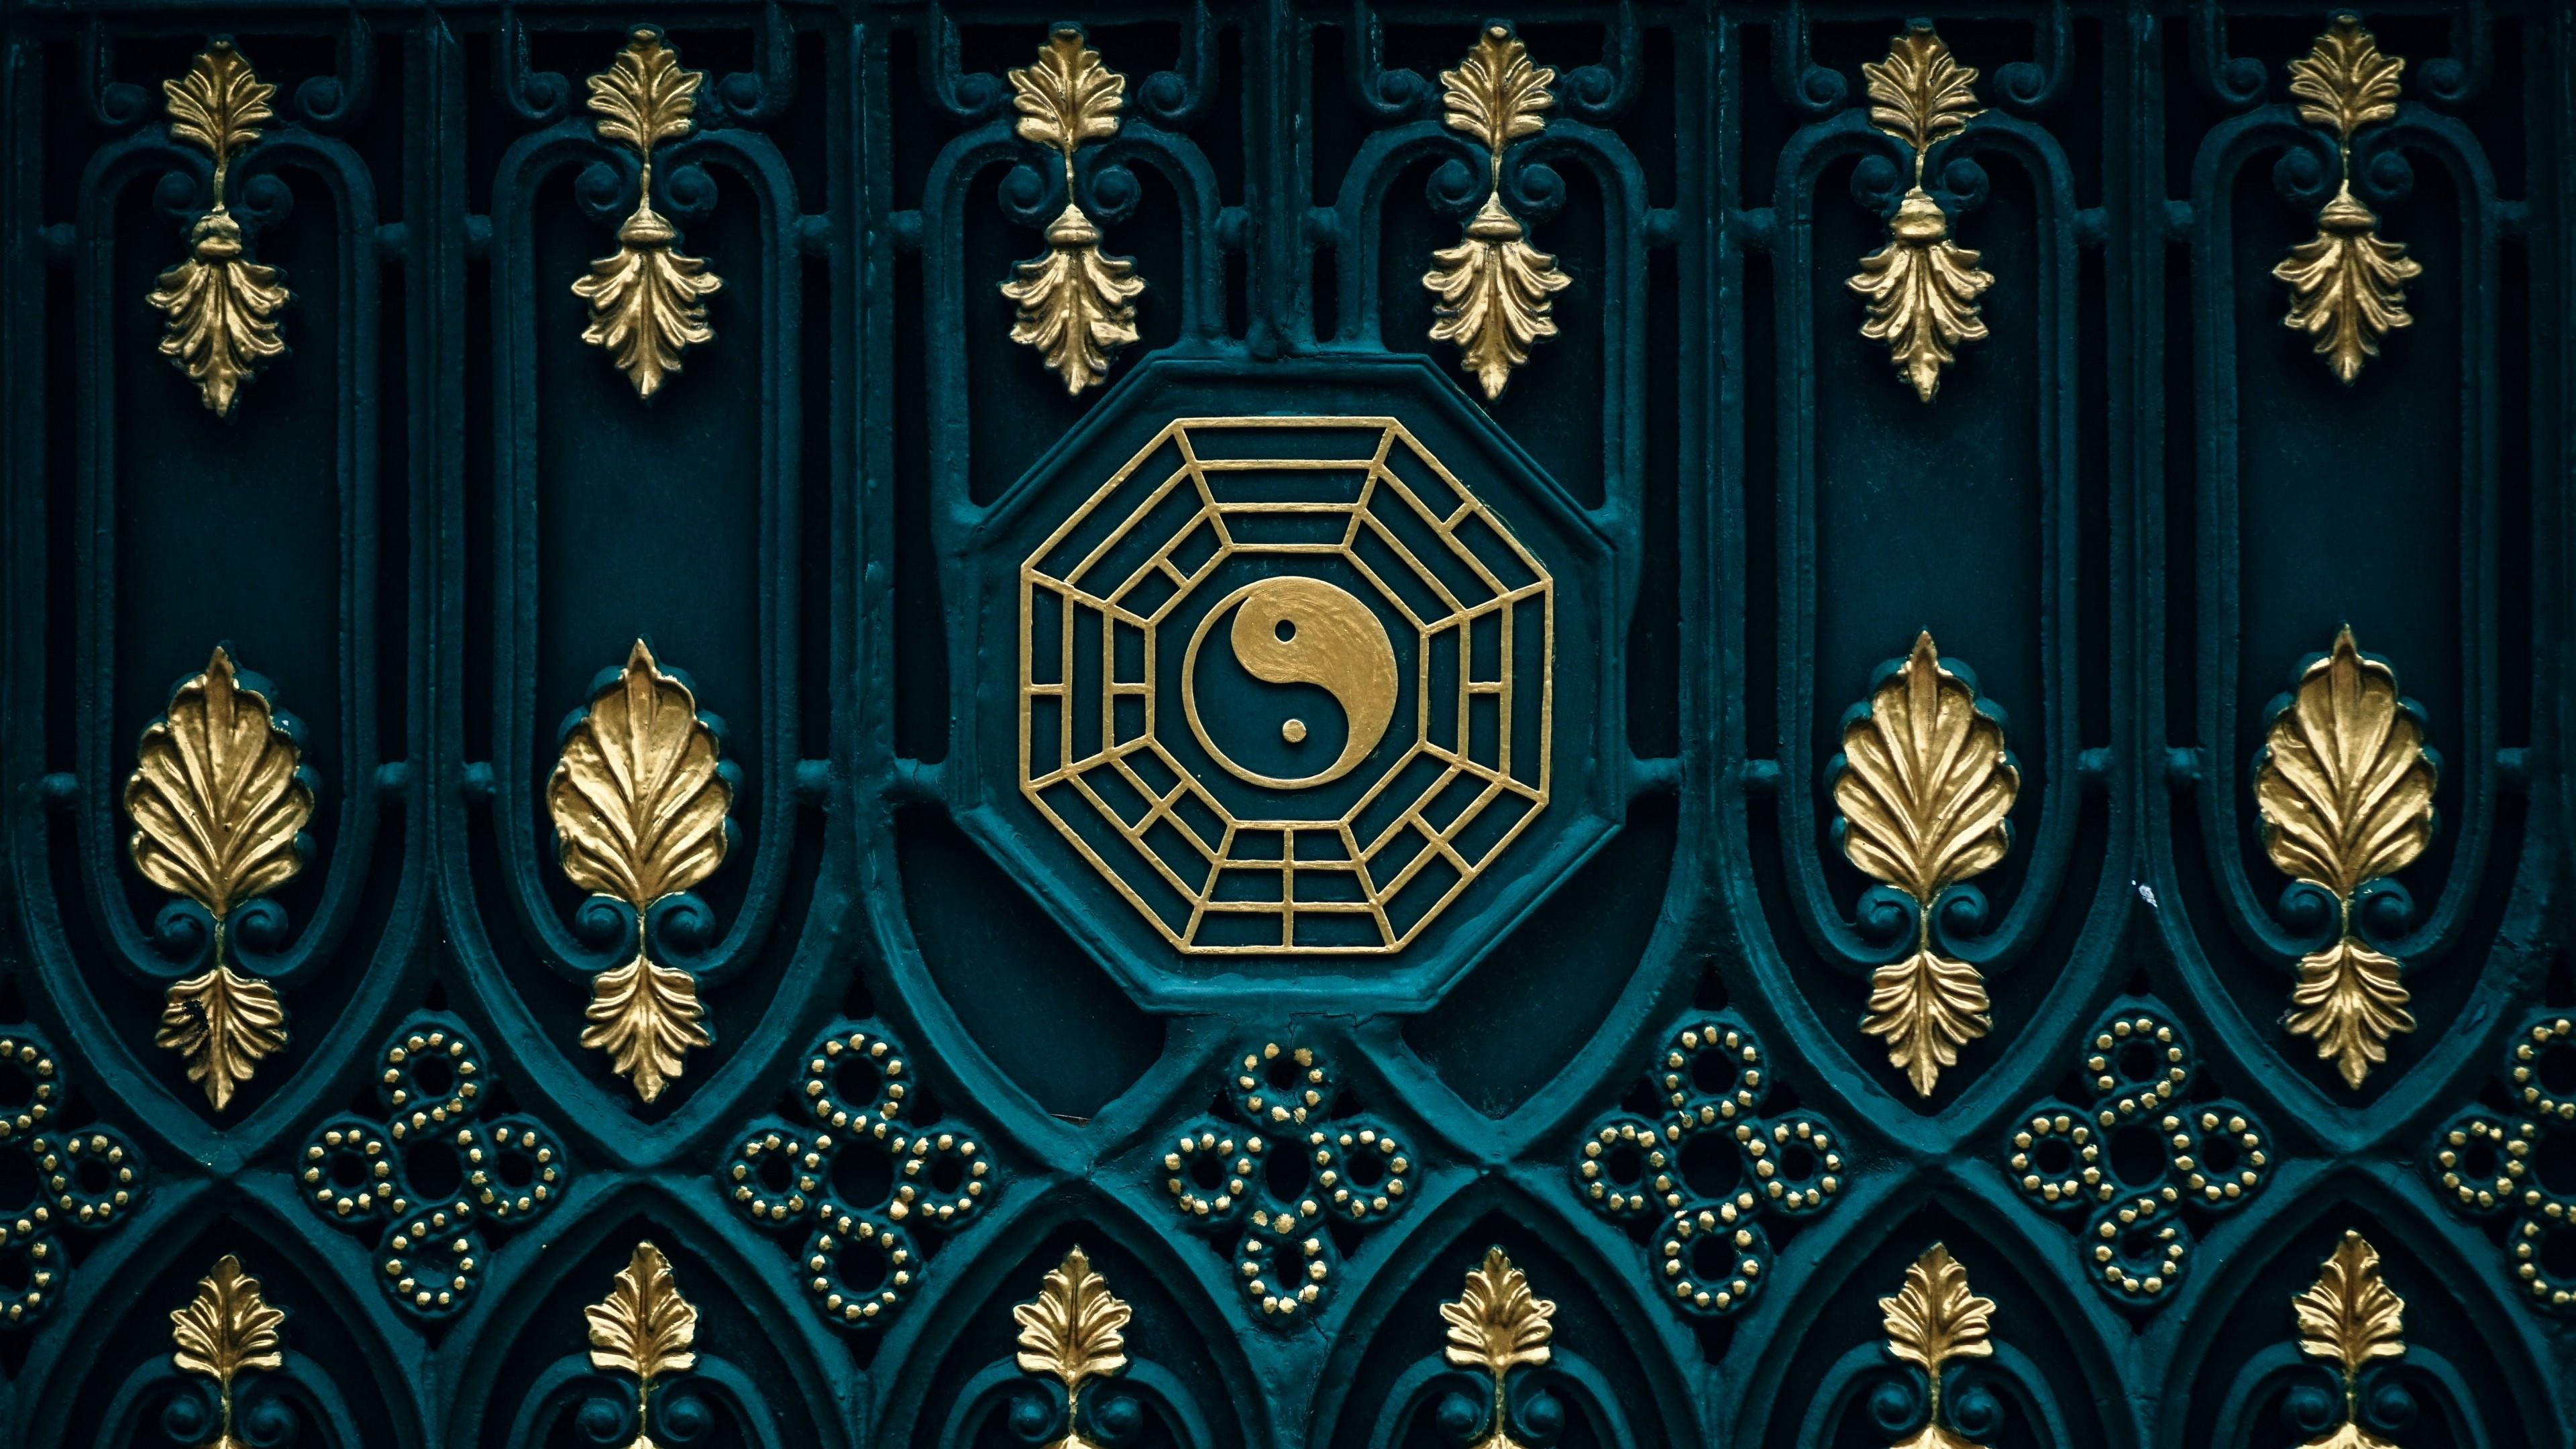 dragon yin yang wallpaper, ying yang image